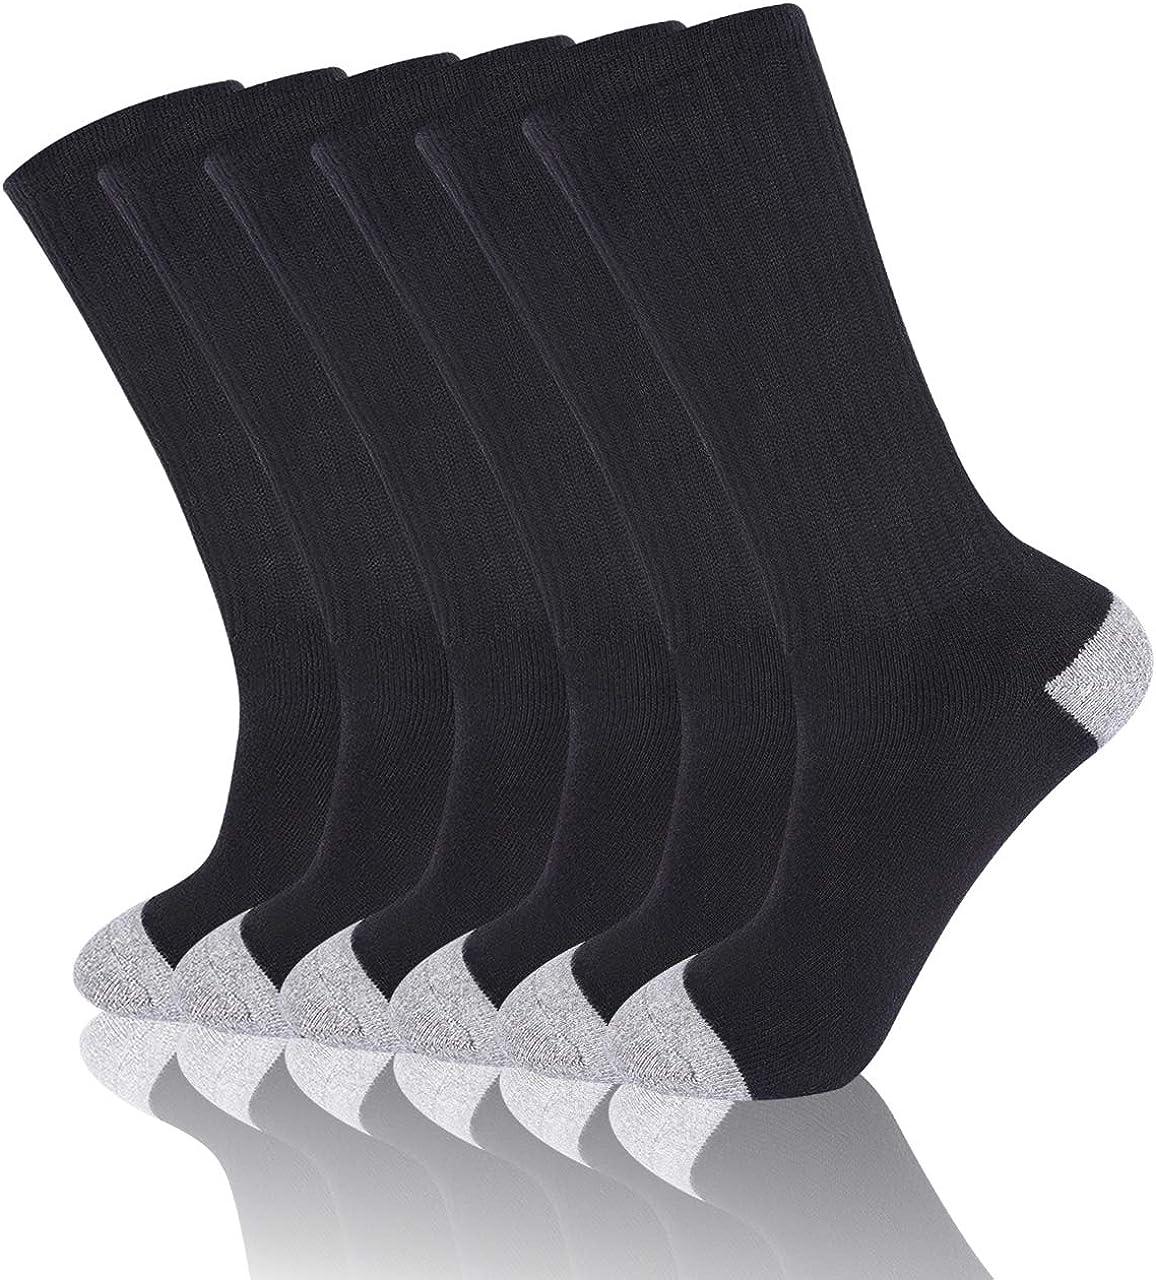 Mens Cushion Crew Socks Moisture Wicking Work Socks 3-6 Pair Mens Thick Socks Cotton 6-12 Hiking Socks